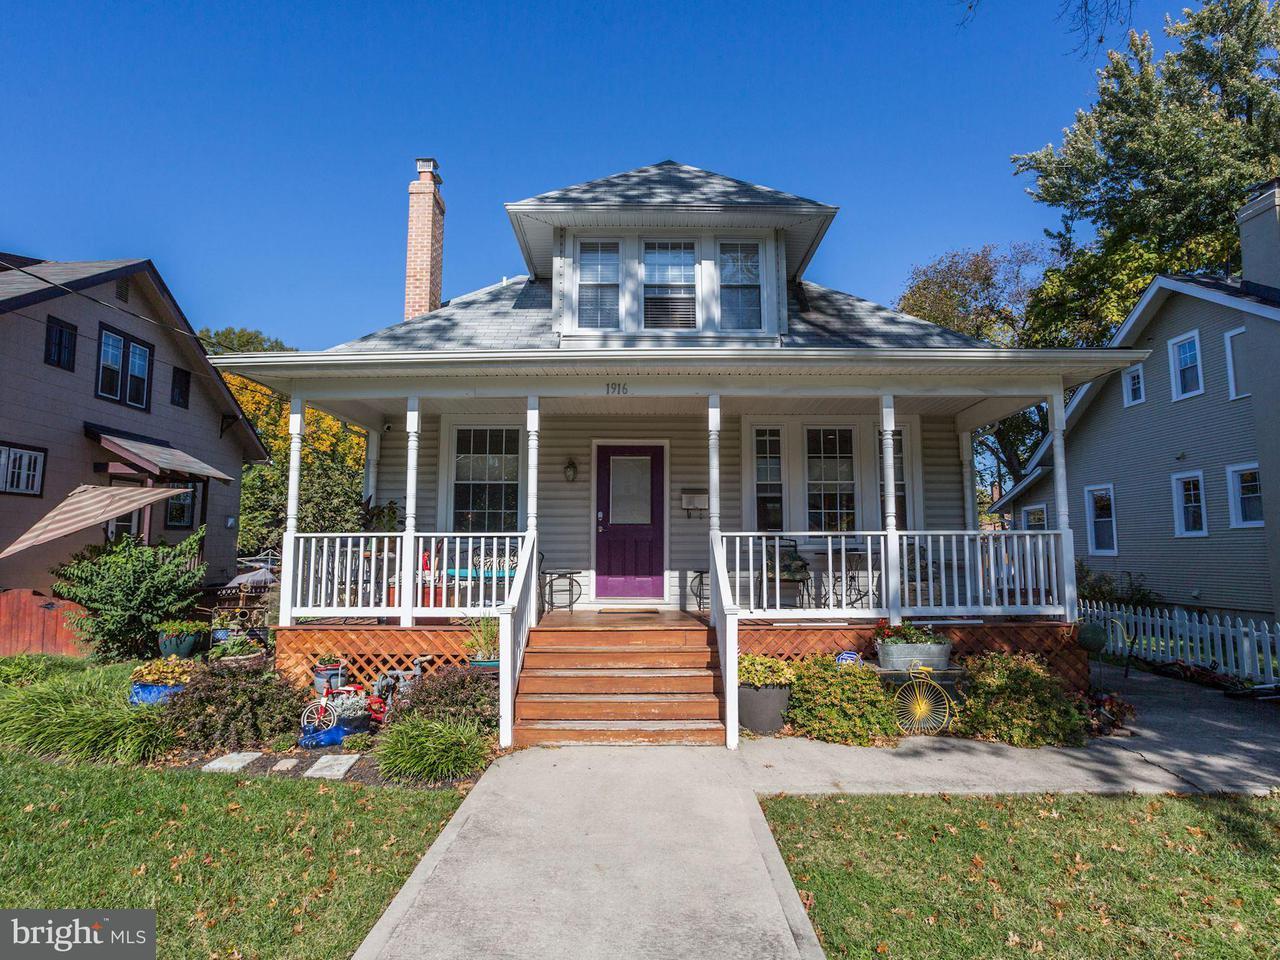 獨棟家庭住宅 為 出售 在 1916 Lawrence St Ne 1916 Lawrence St Ne Washington, 哥倫比亞特區 20018 美國